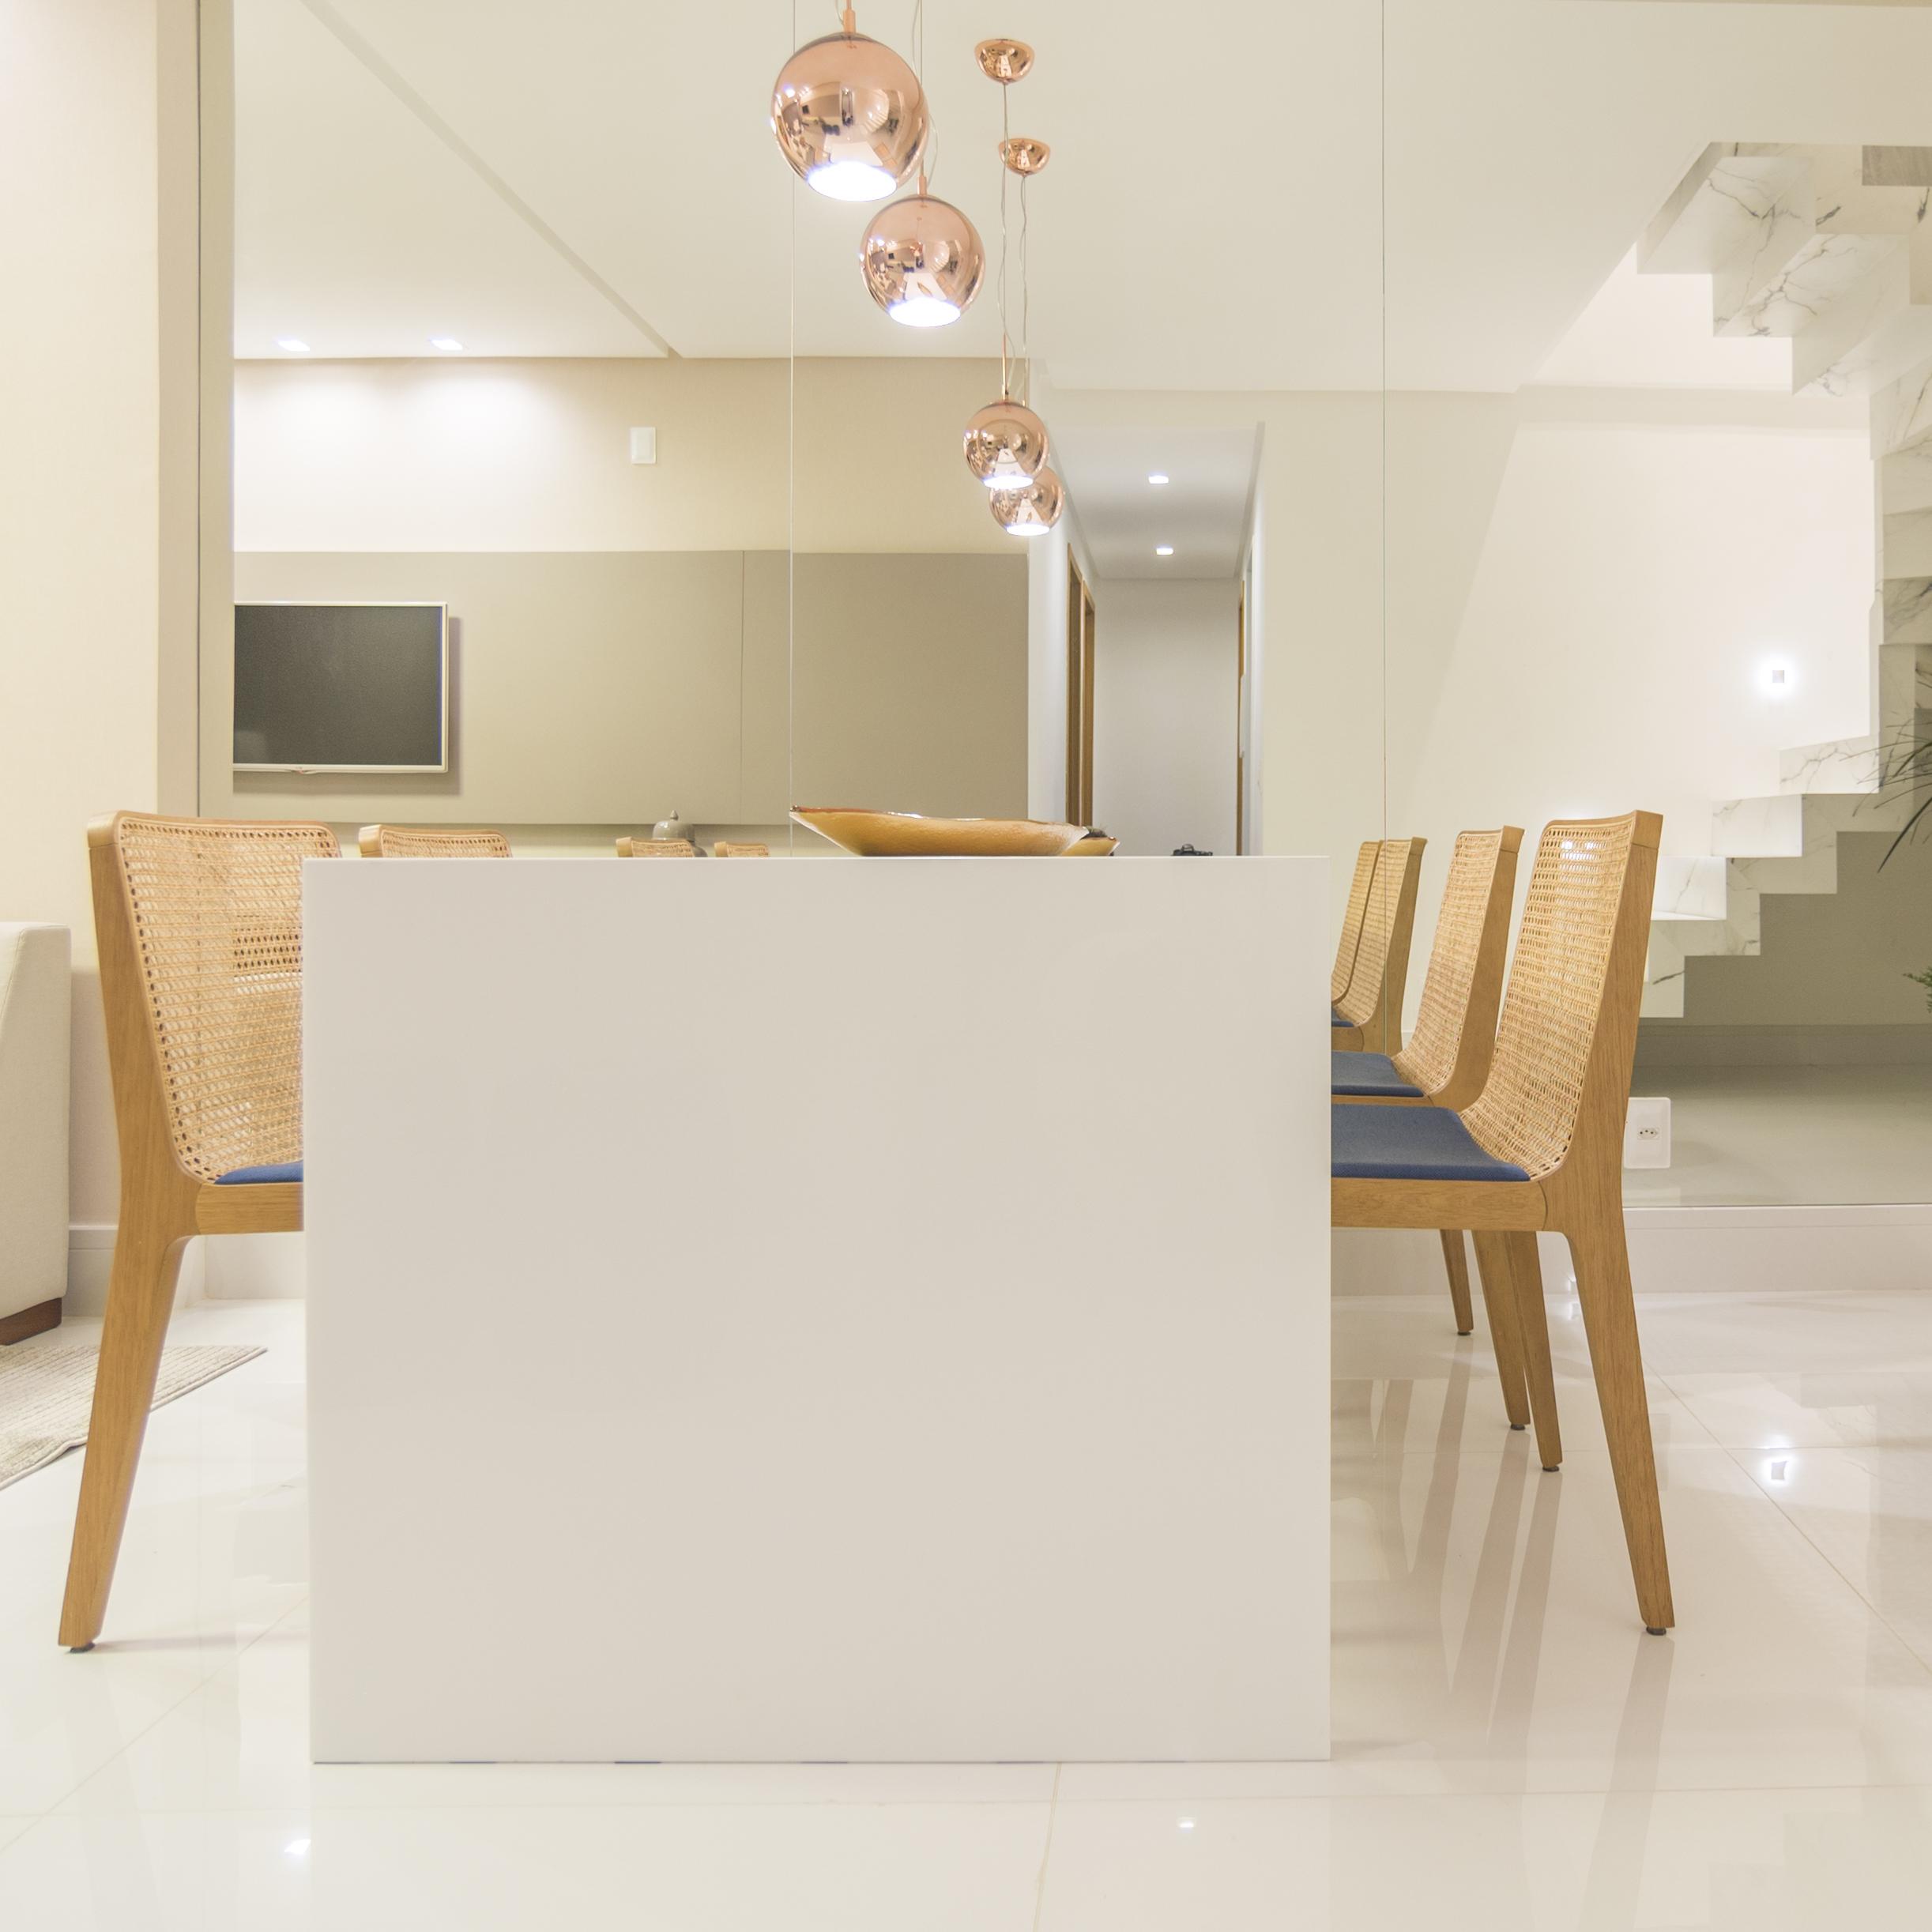 projeto-arquitetonico-robertoindira-duo-arquitetura-apartamentos-estar-04.jpg